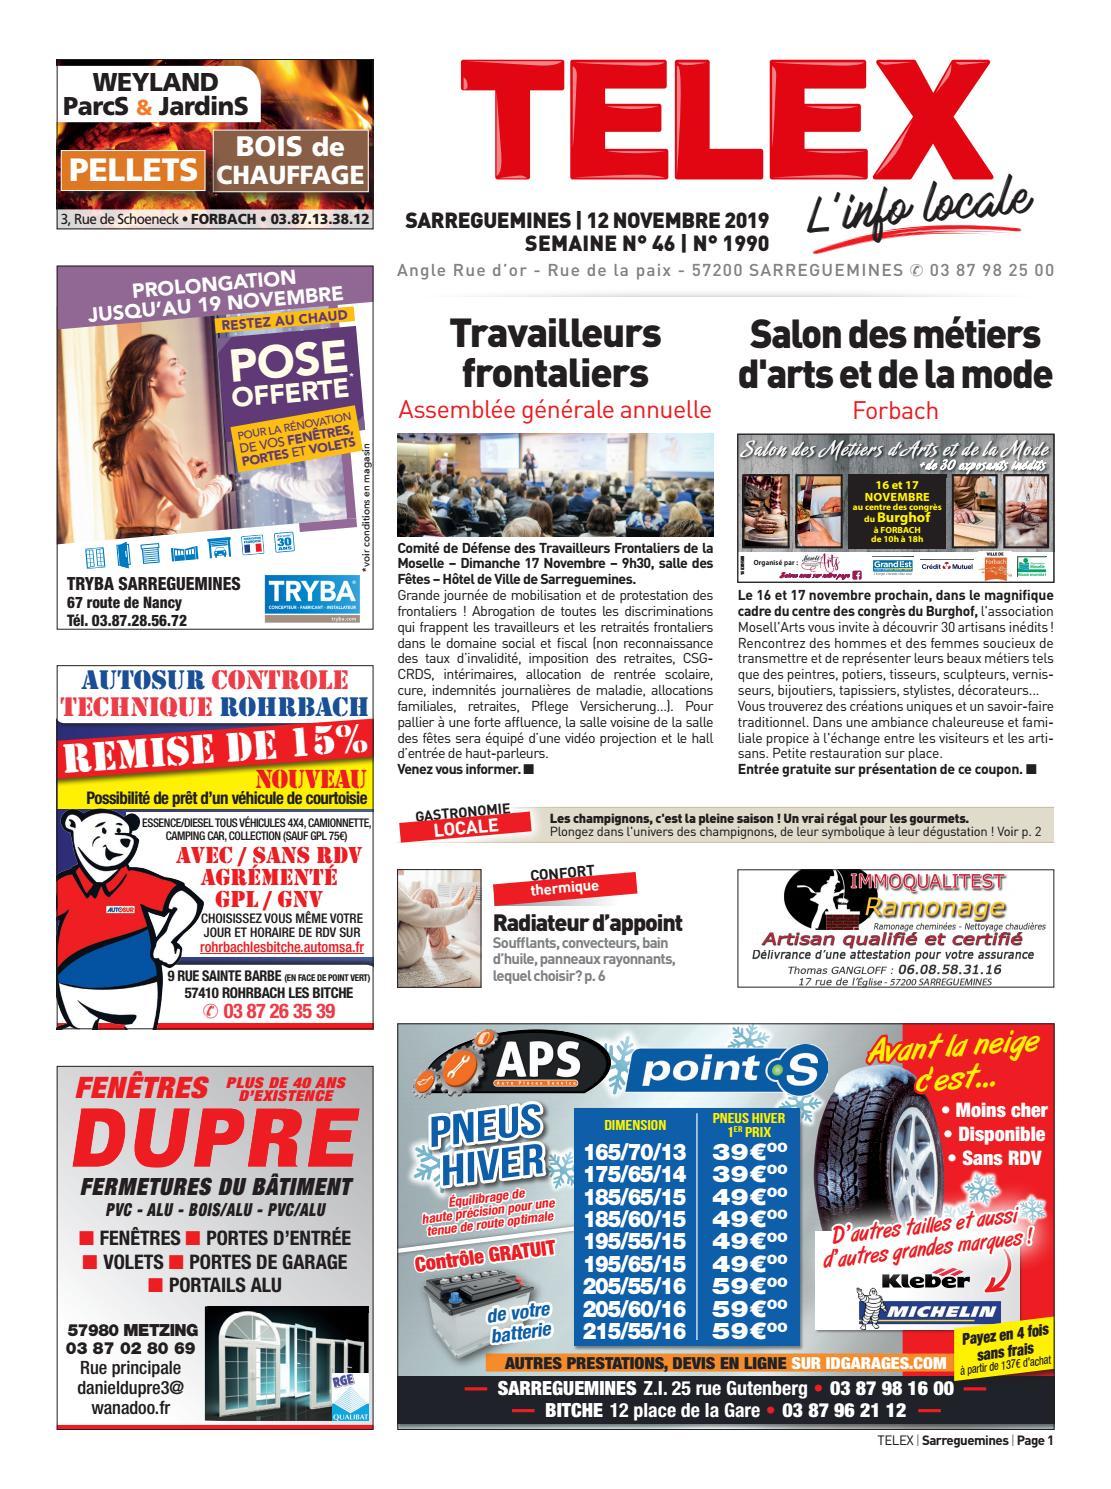 Pro Gouttiere Sainte Cecile 4619 sarregueminesclaude vervin - issuu